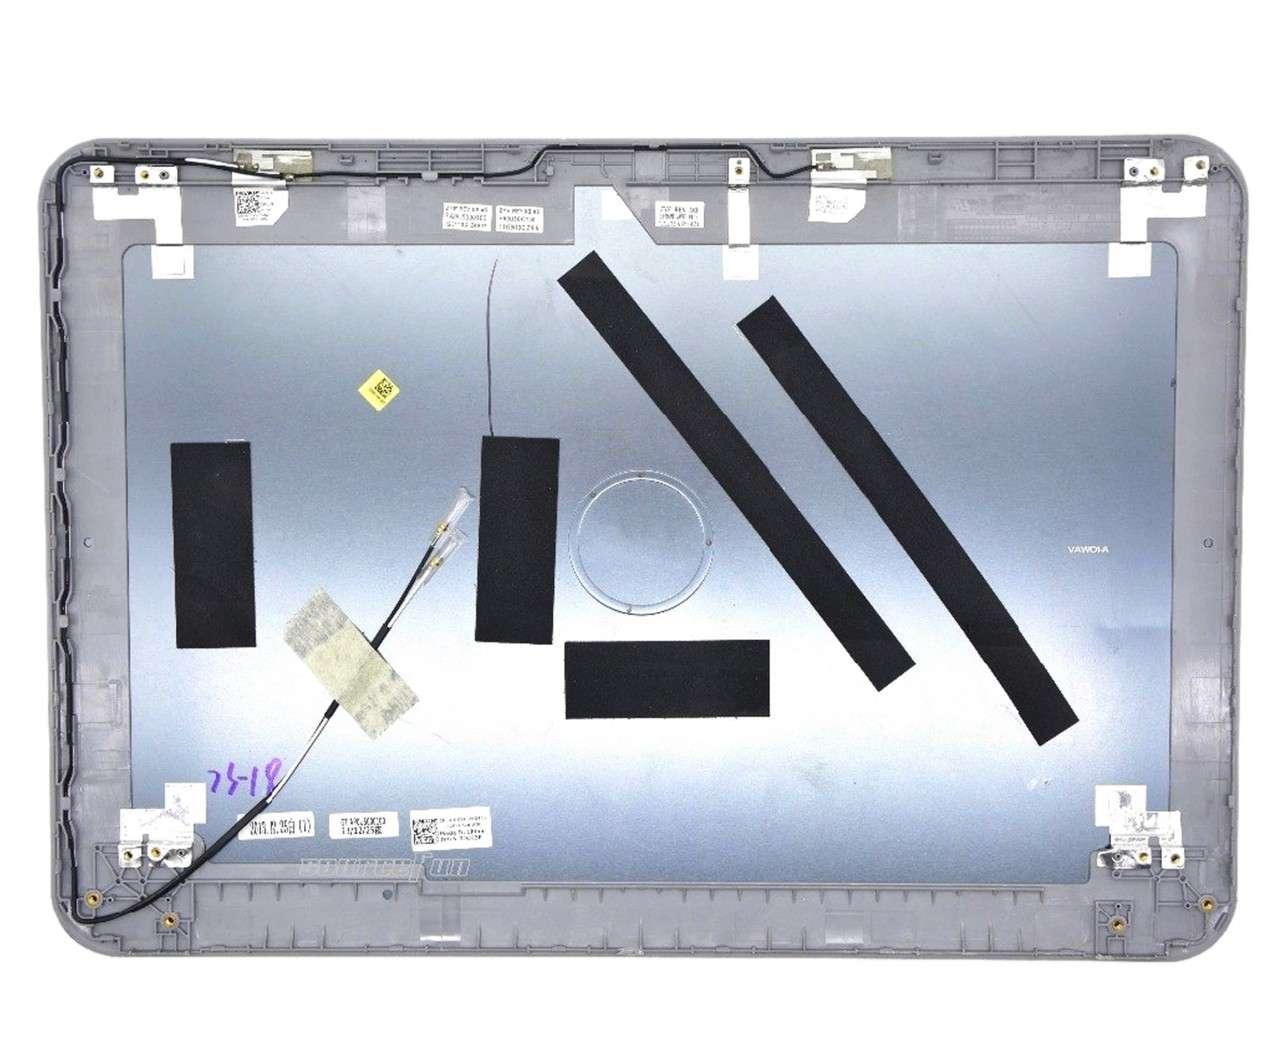 Capac Display BackCover Dell Inspiron 5521 Carcasa Display Gri Metalic imagine powerlaptop.ro 2021